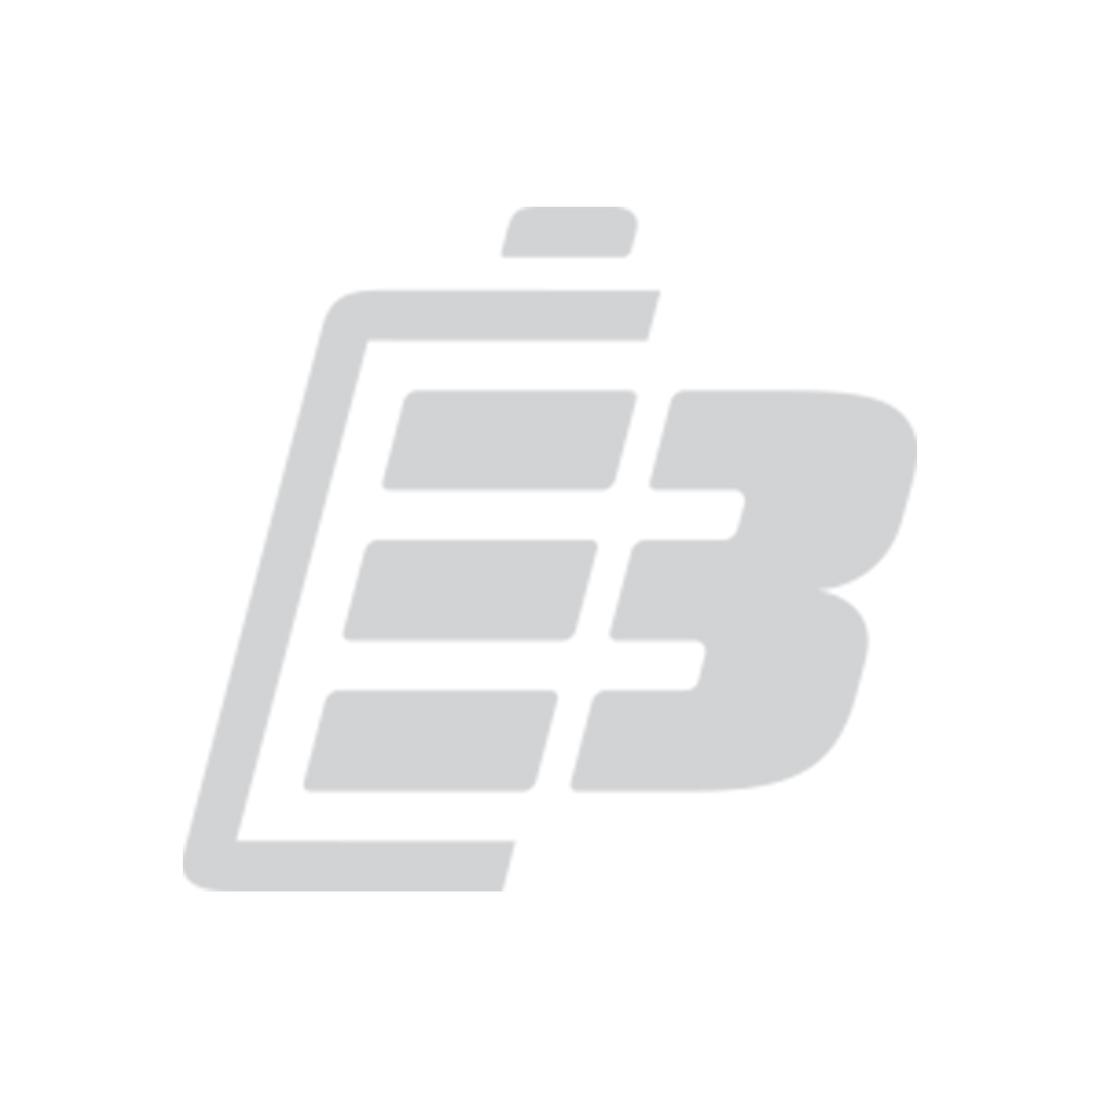 Remote control battery Logitech Harmony 1000_1